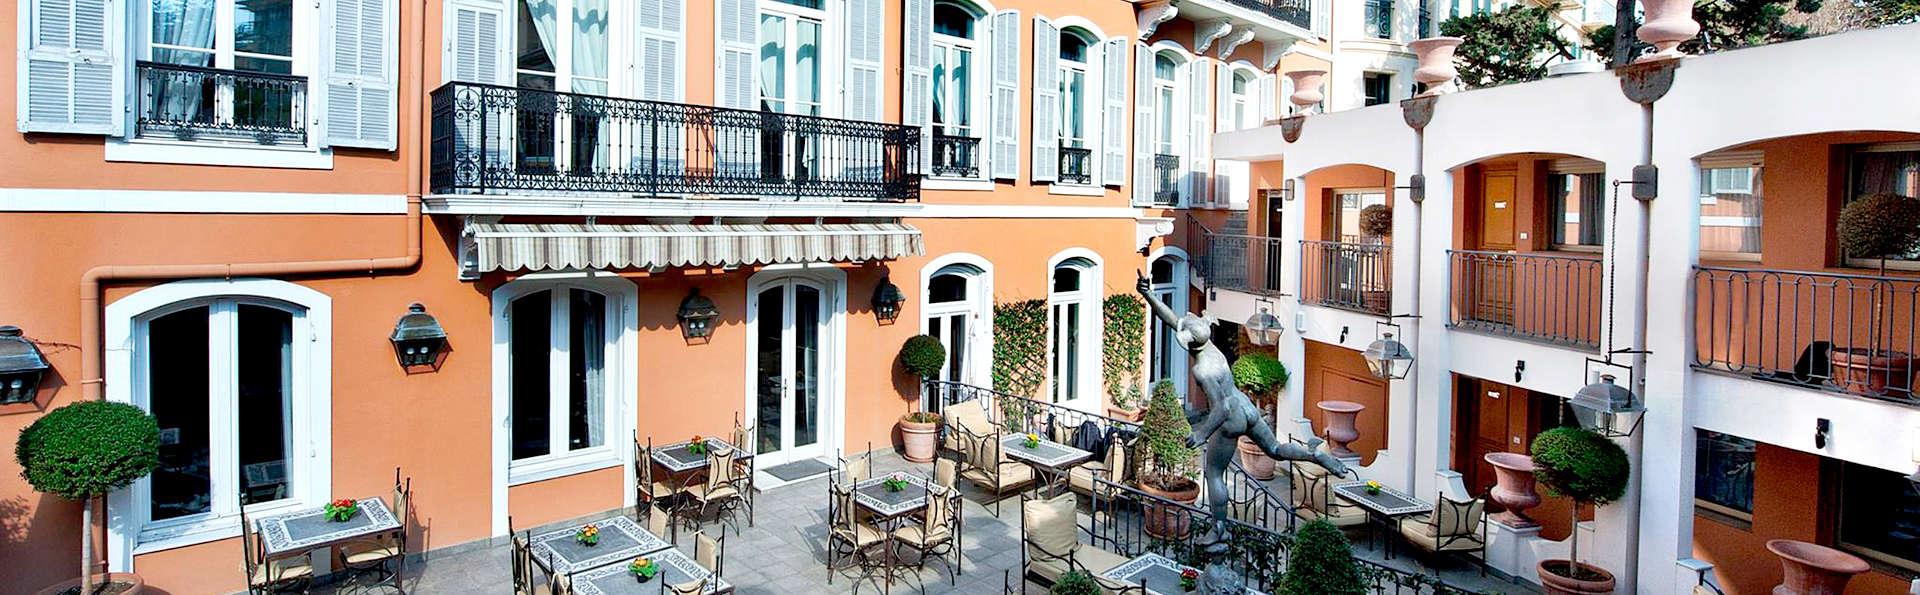 H tel ellington h tel de charme nice for Reservation hotel paca